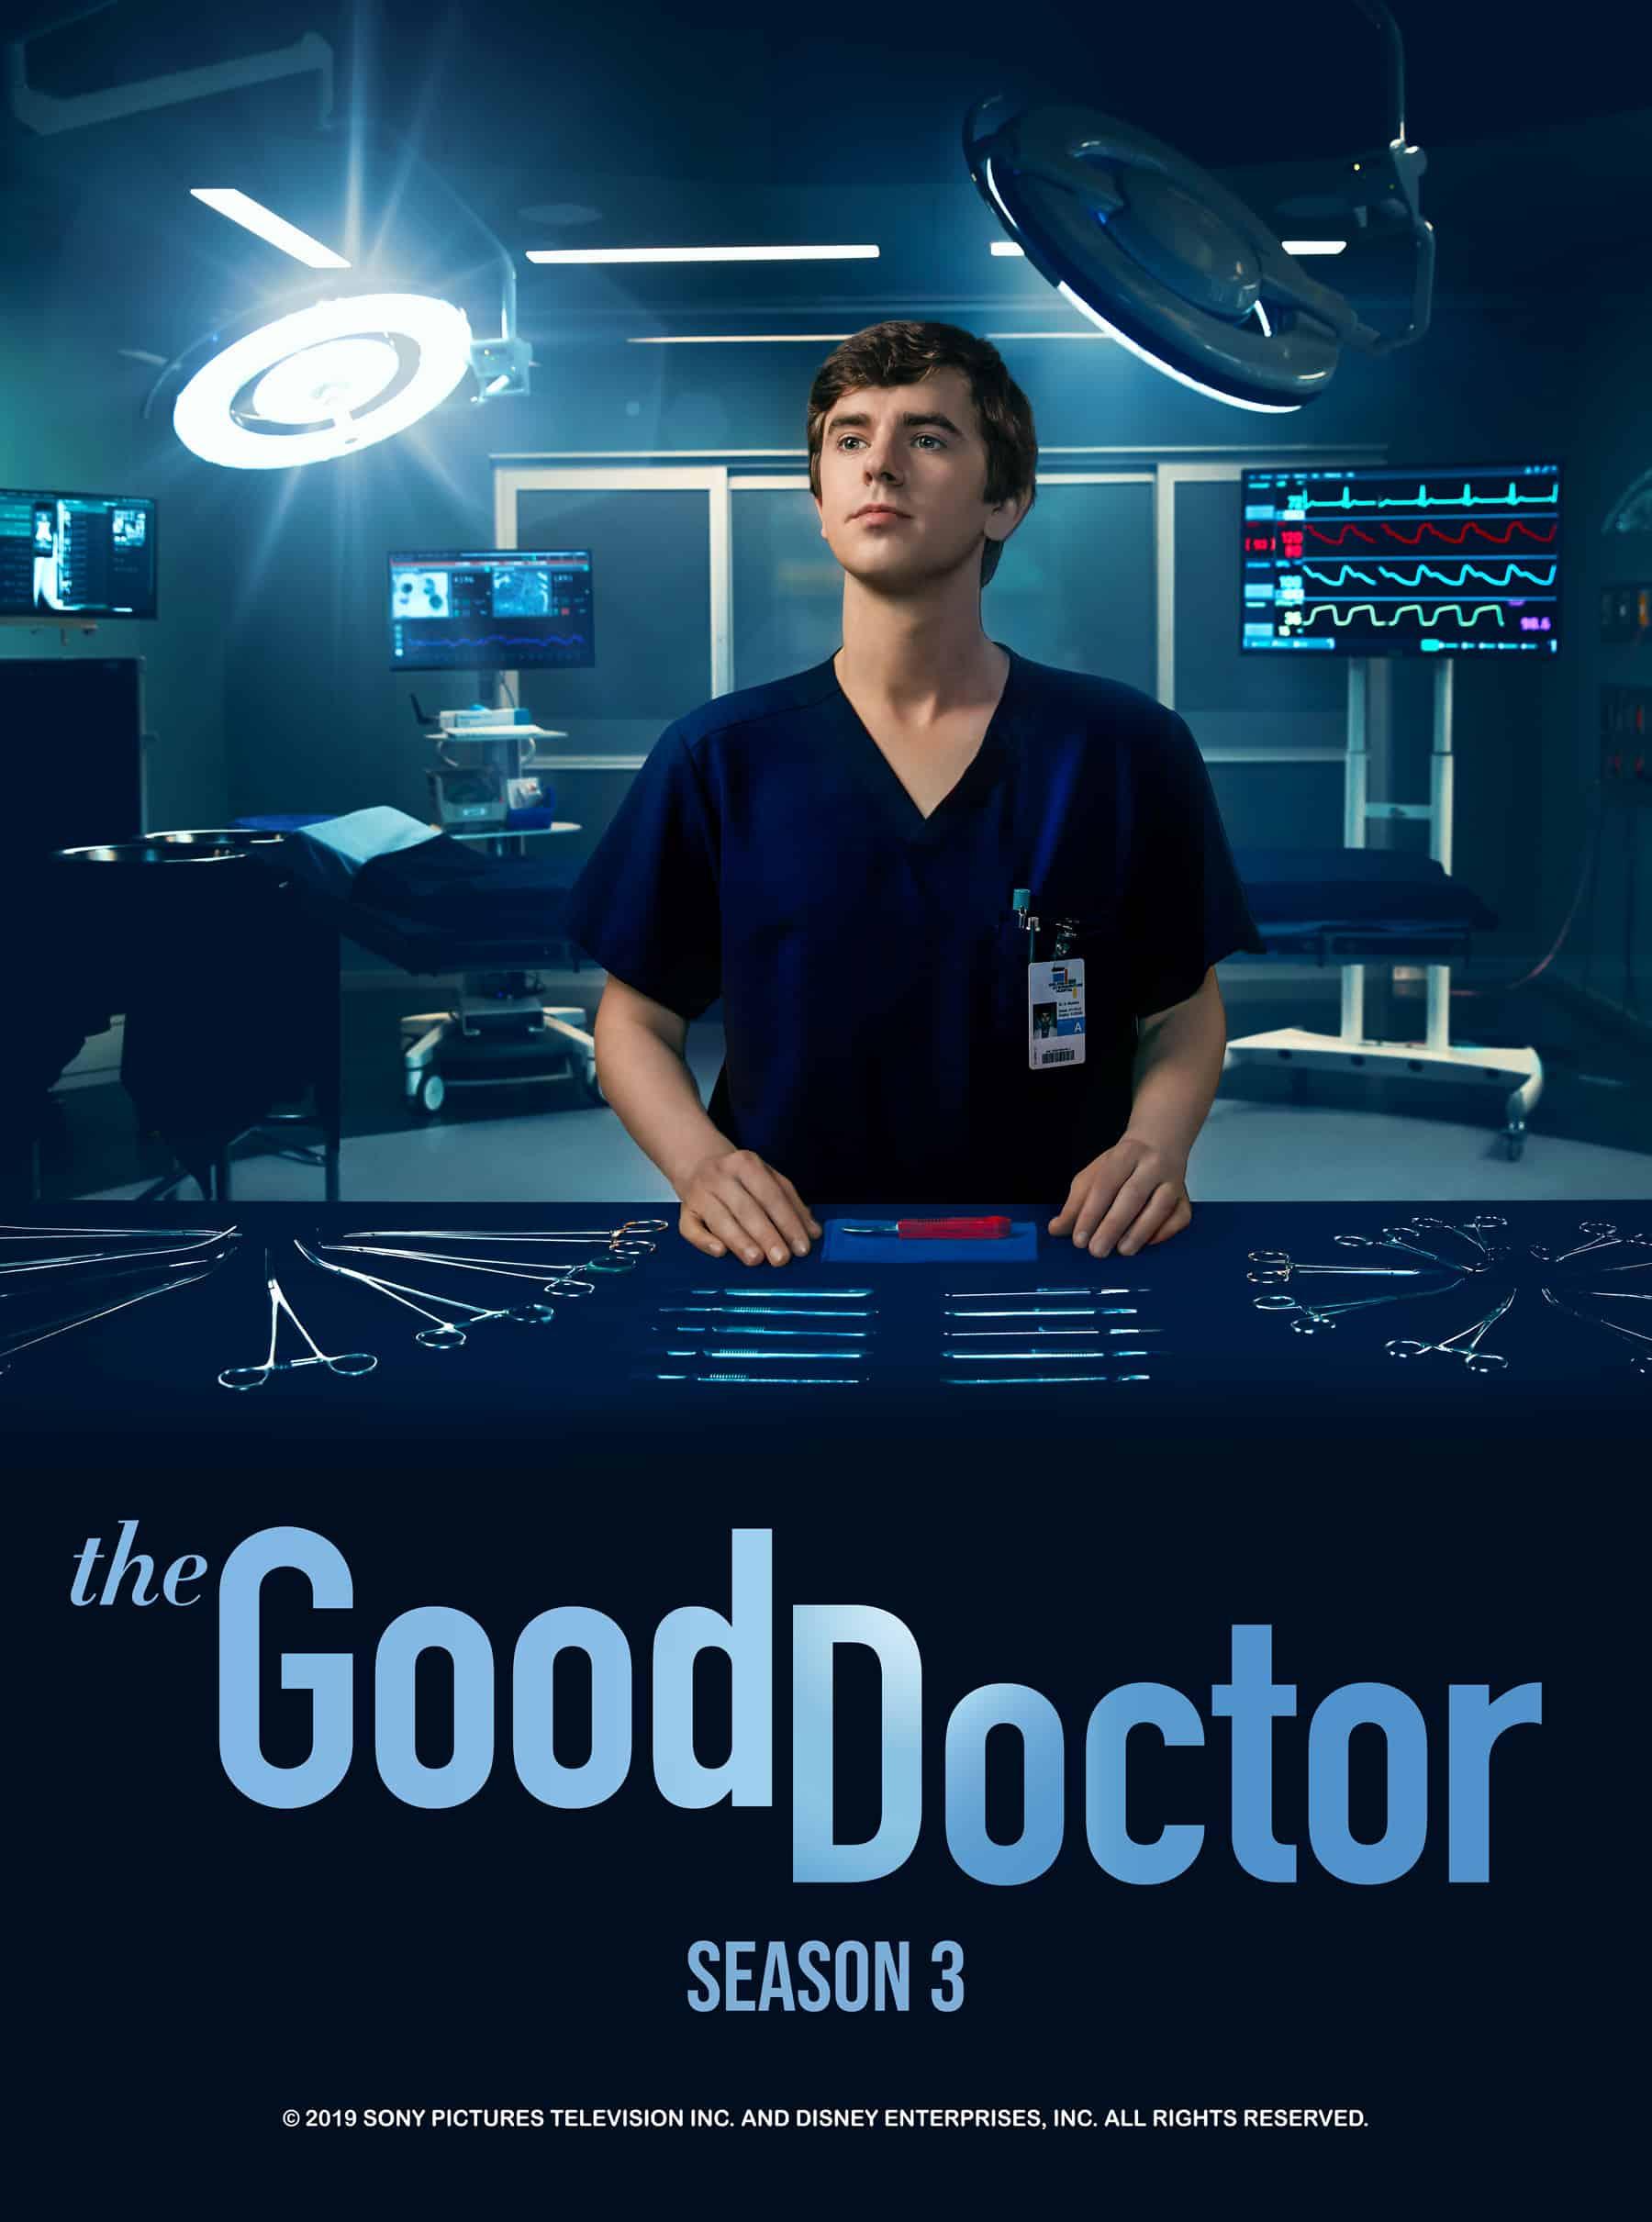 The Good Doctor Season 3 แพทย์อัจฉริยะหัวใจเทวดา ปี 3 ซับไทย EP1 – EP17